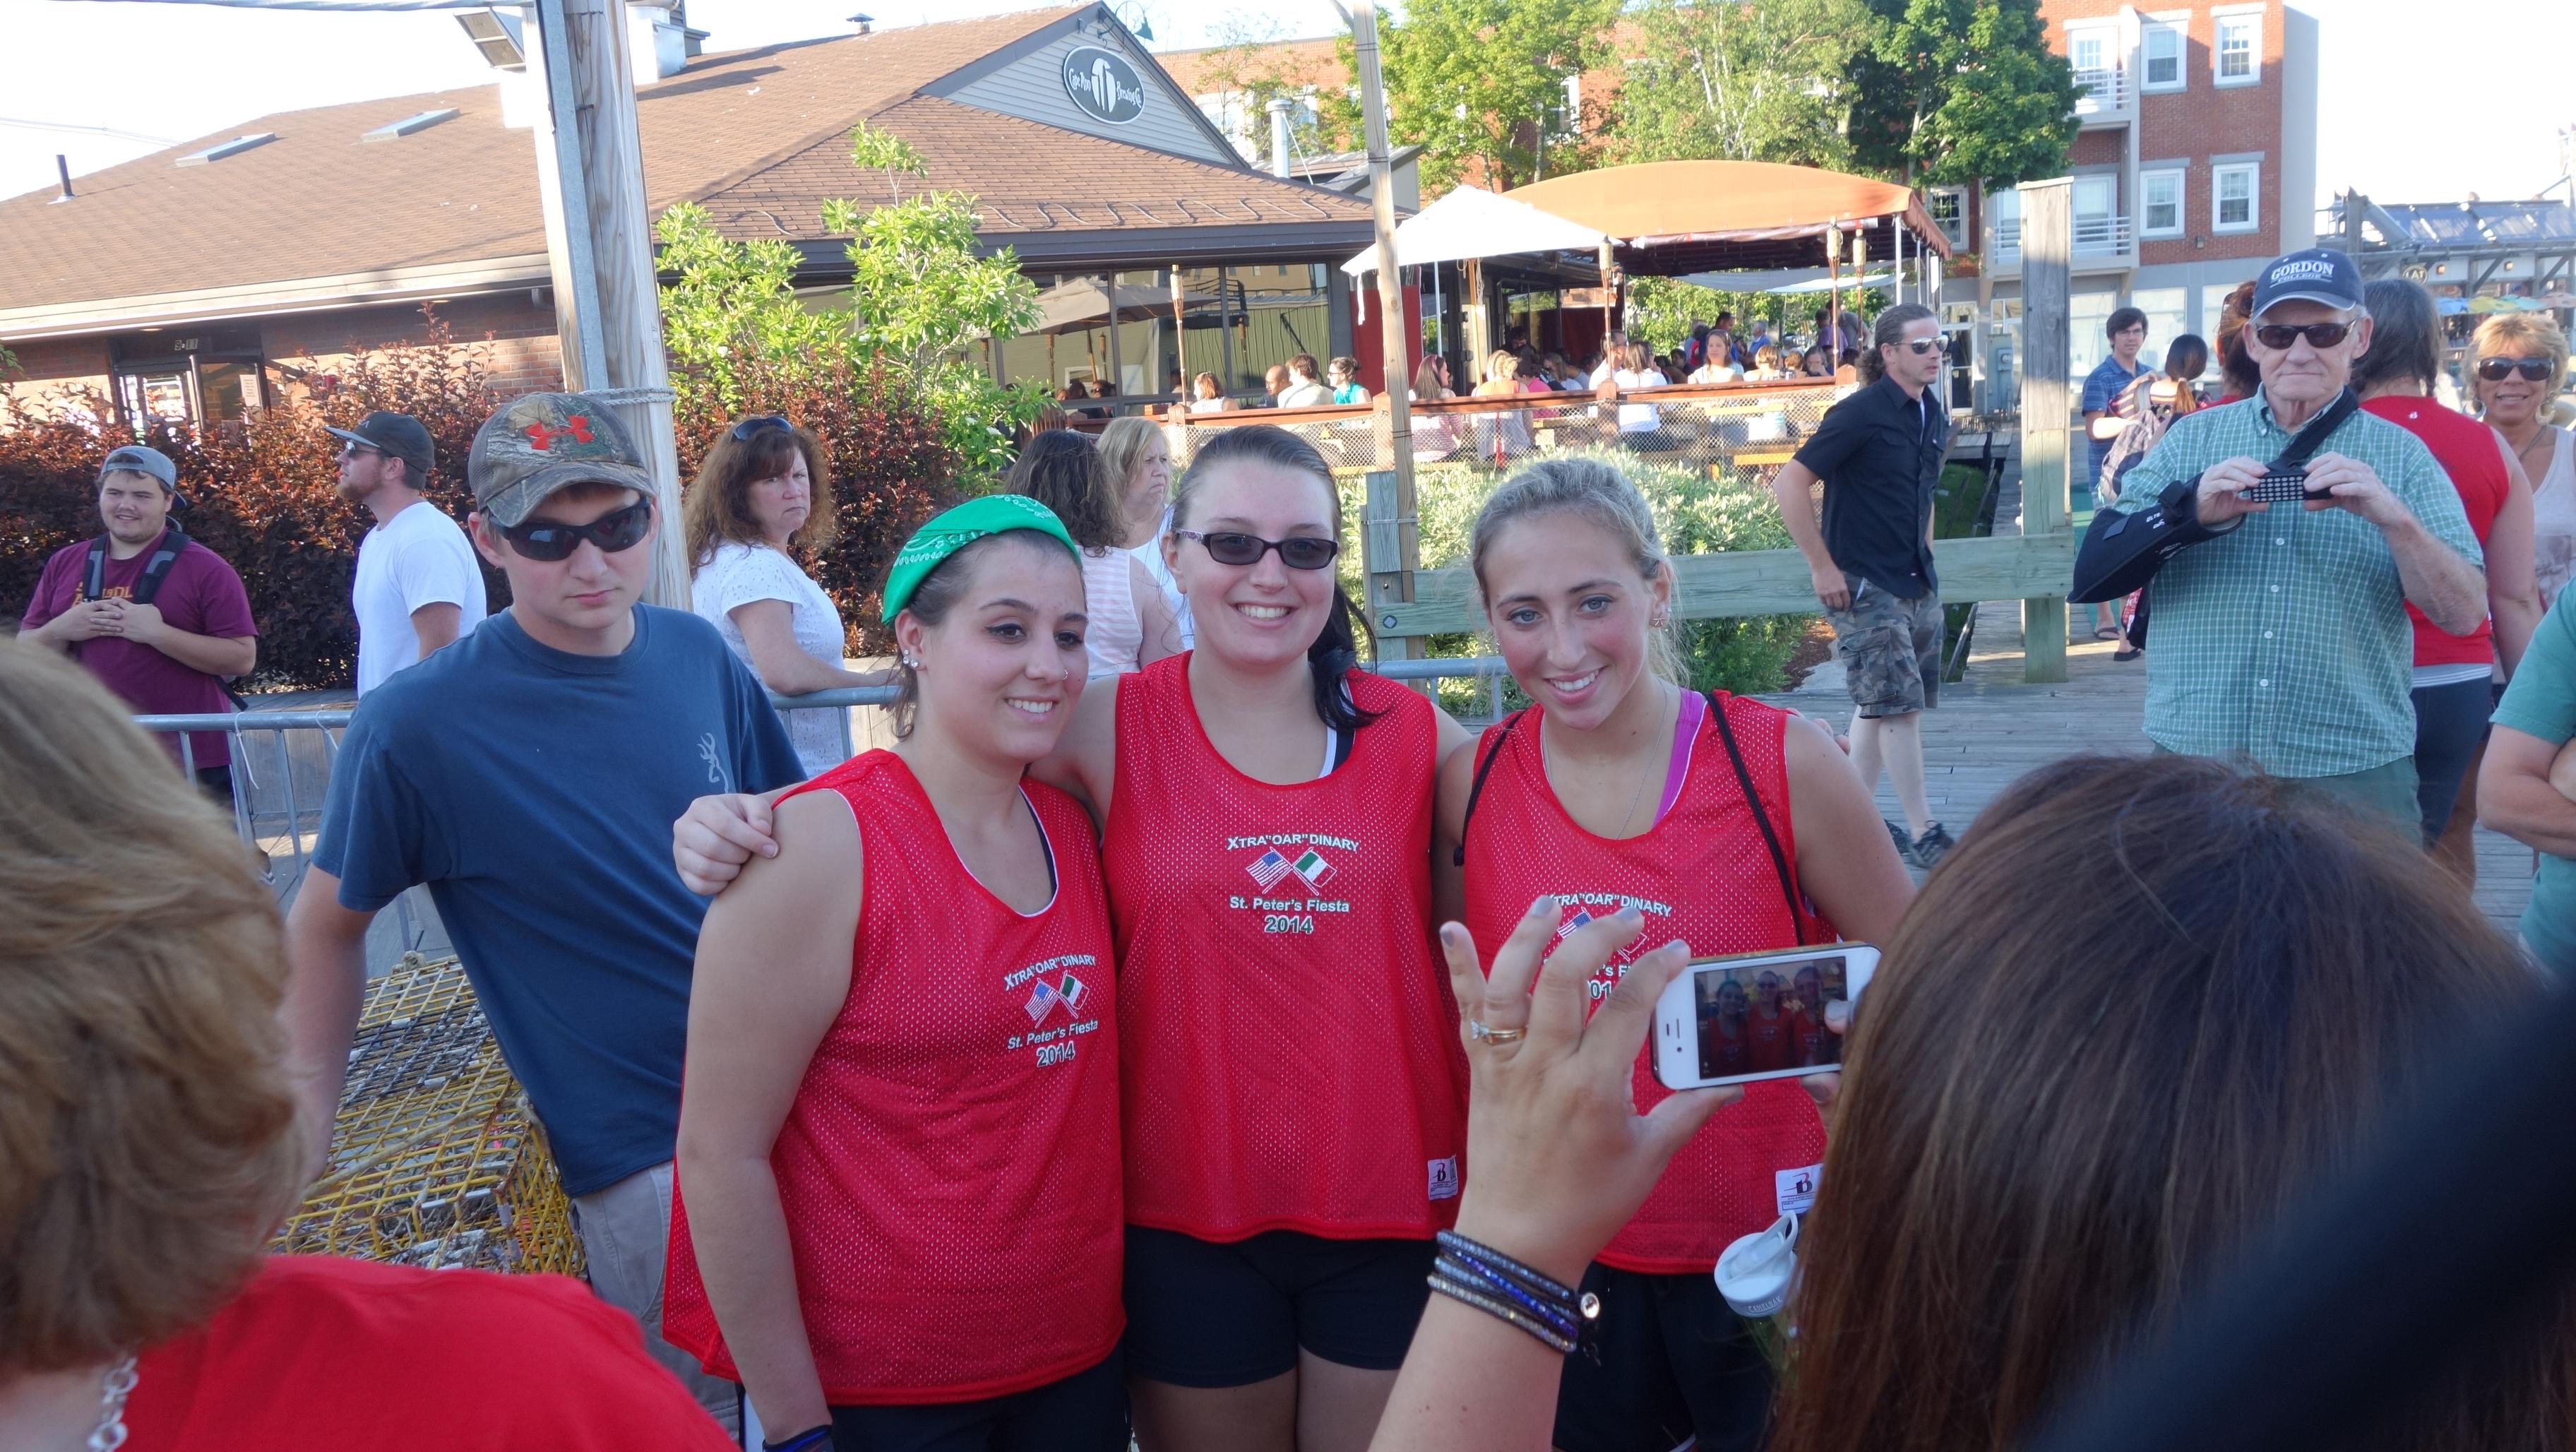 Amanda Race St. Peter's Fiesta 2014 Camps! 378